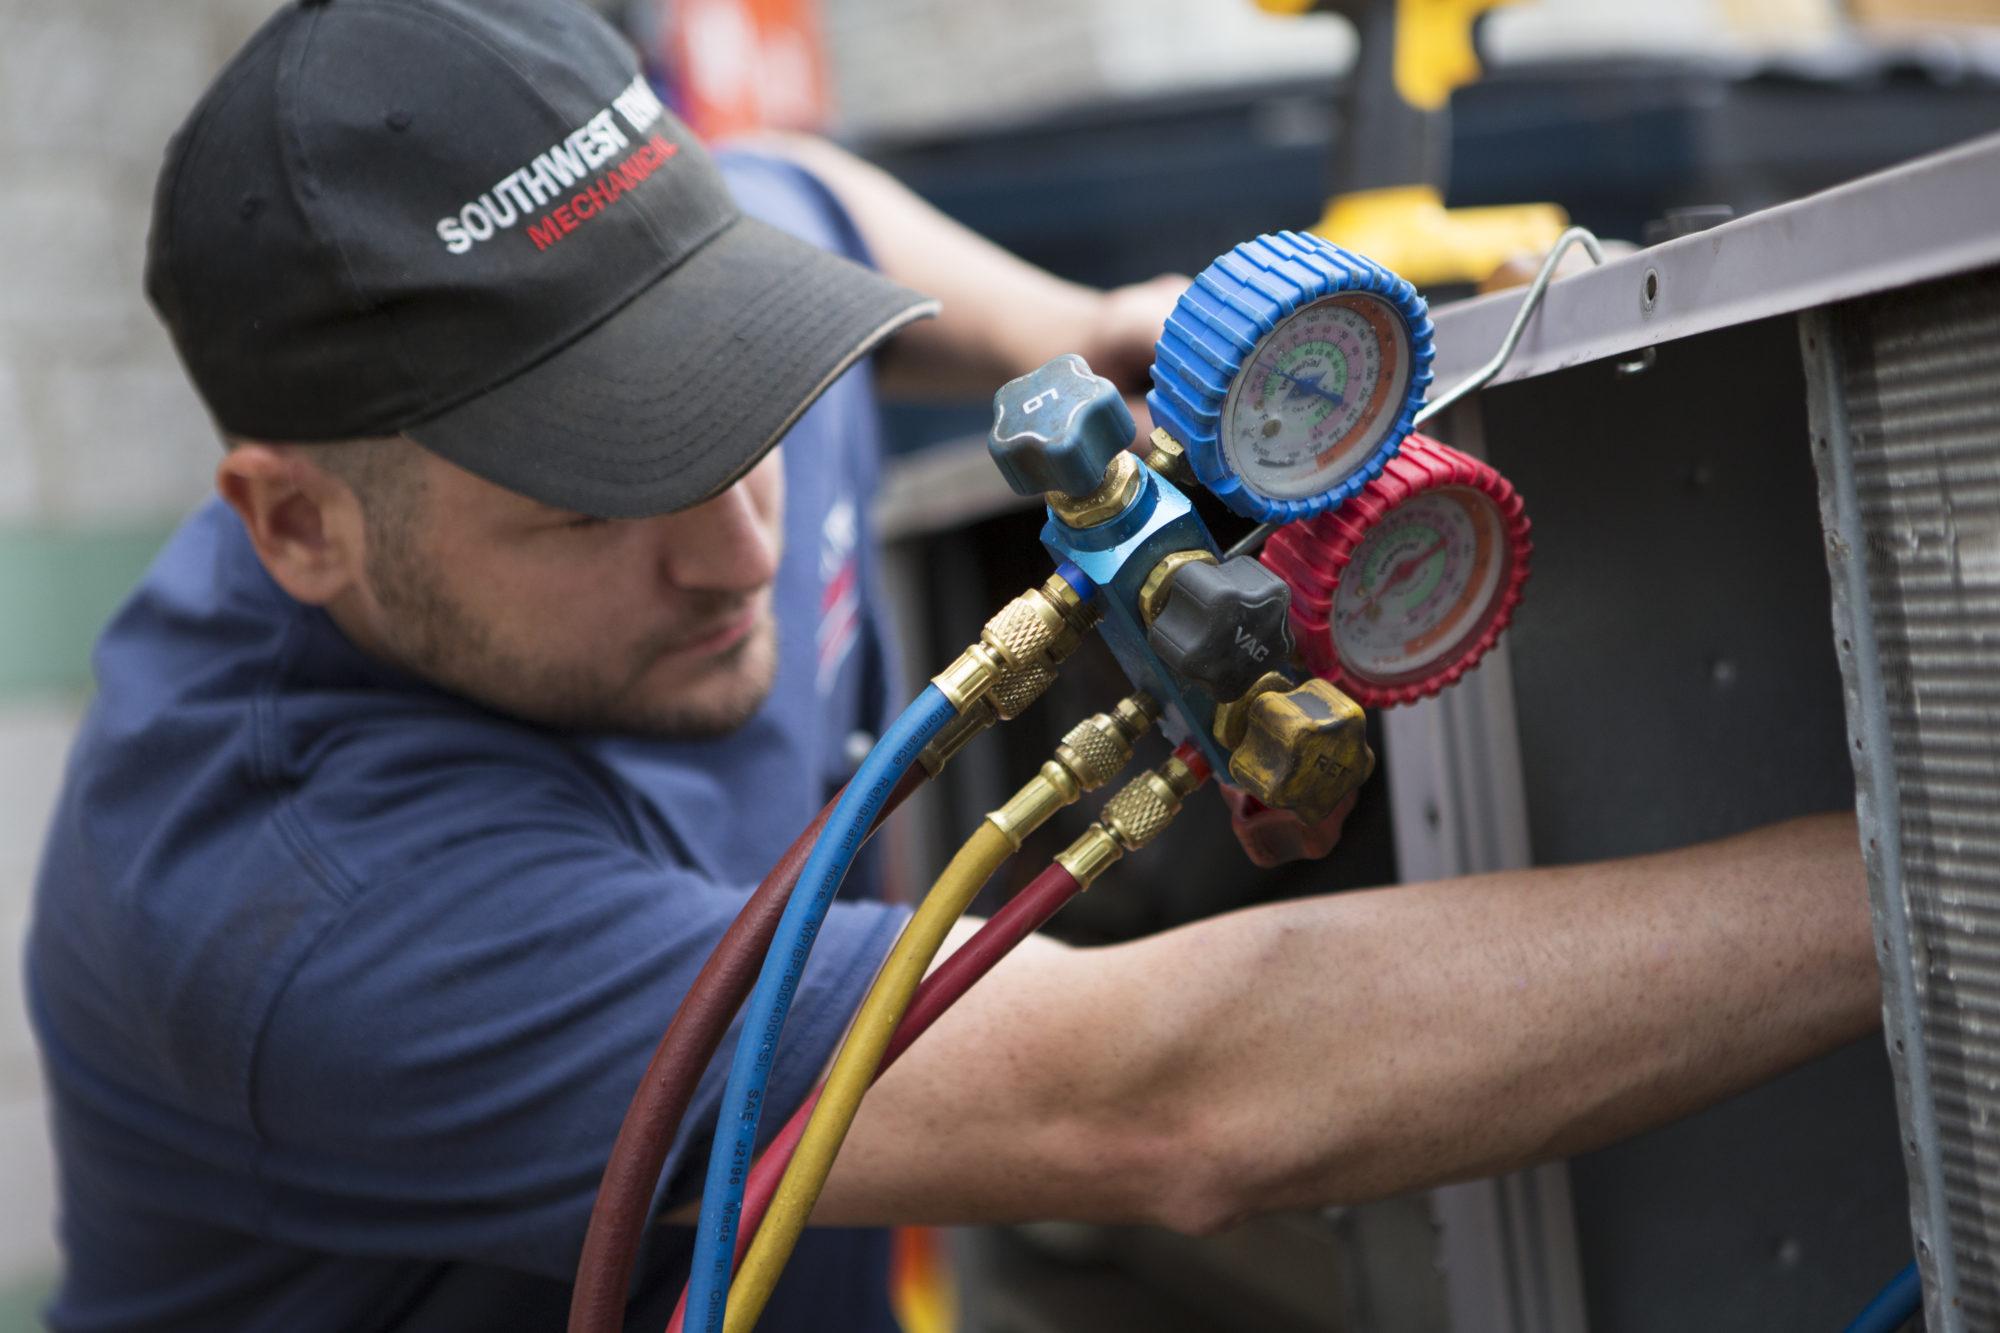 North Point Boiler Preventative Maintenance